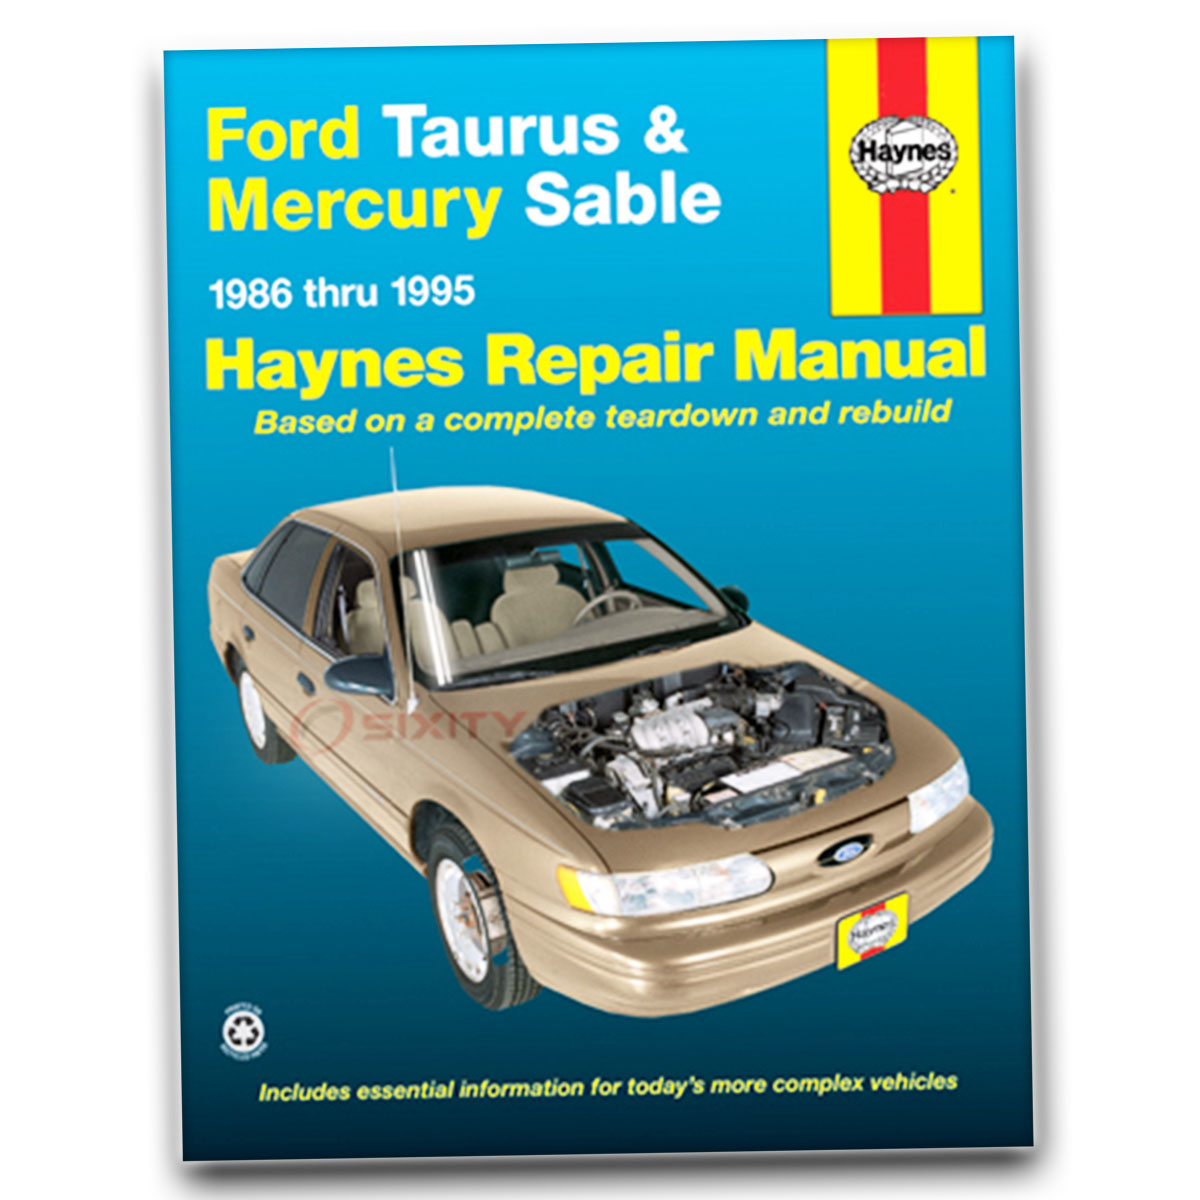 ford taurus haynes repair manual mt5 l gl lx se shop service garage rh ebay com 2007 Ford Taurus Repair Manuals 1991 Ford Taurus Repair Manual